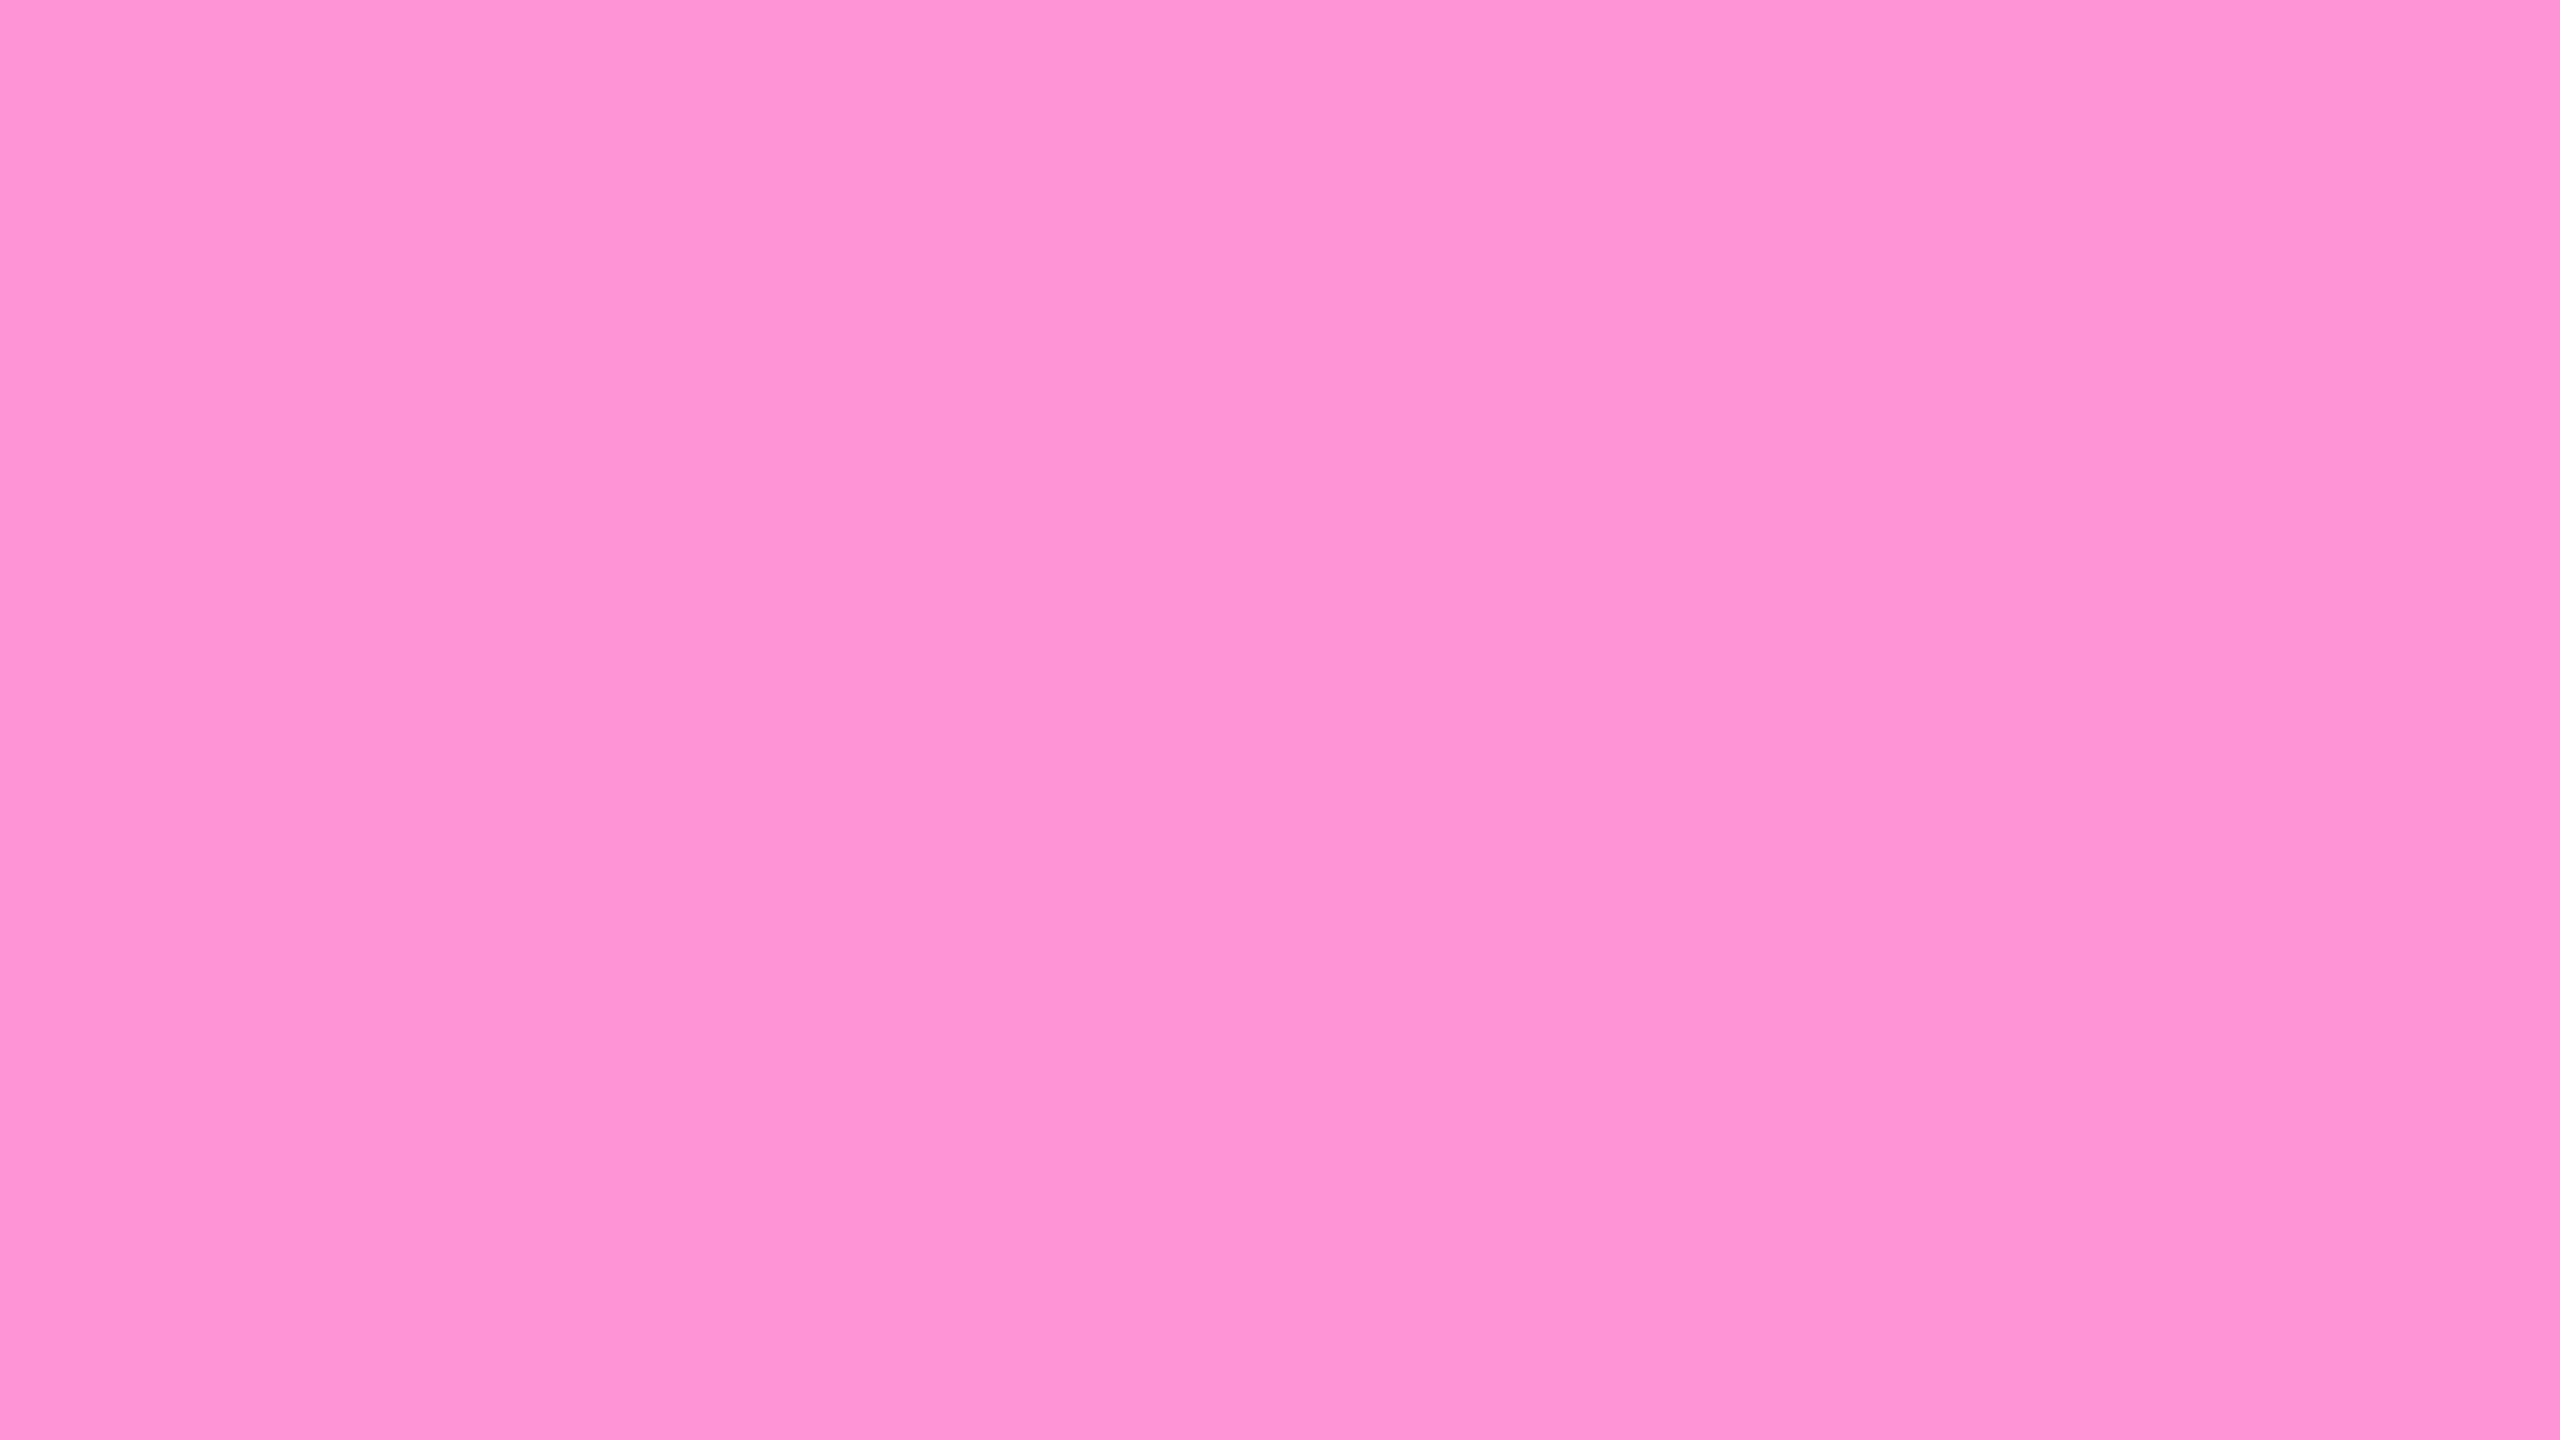 Solid color wallpapers desktop 70 images - Pastel pink wallpaper hd ...